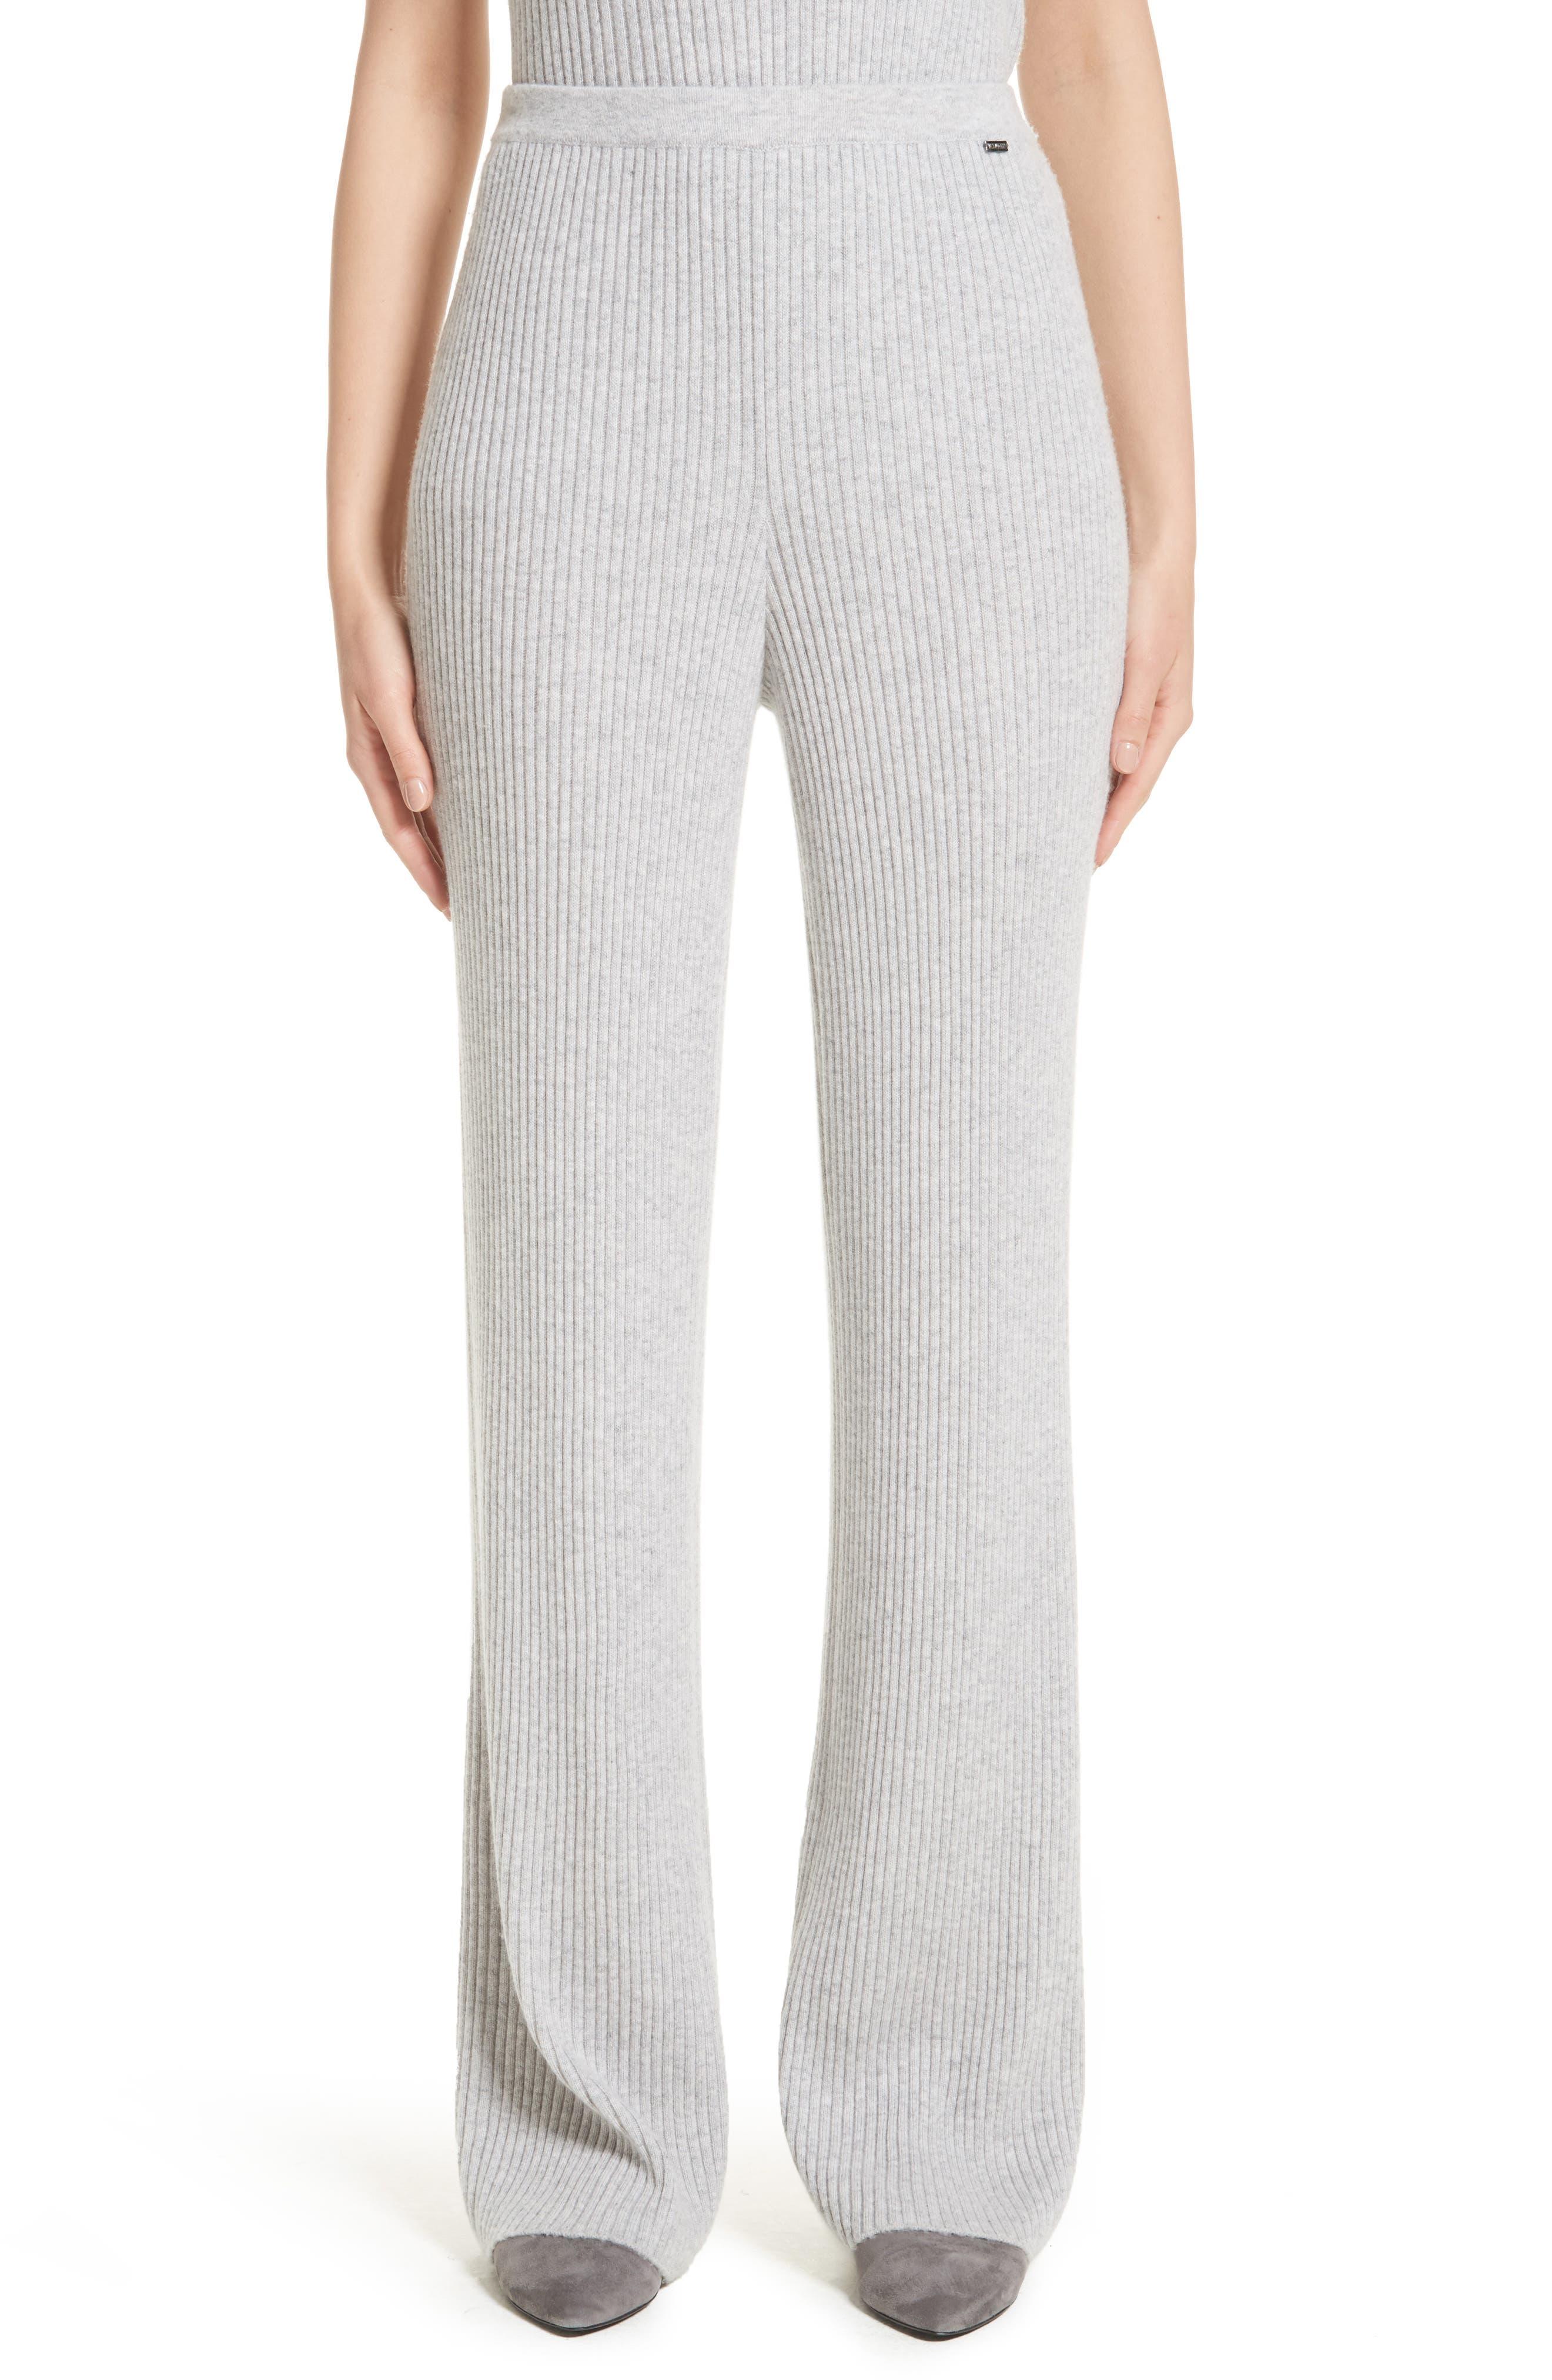 Cashmere Knit Pants,                         Main,                         color, Light Grey Melange